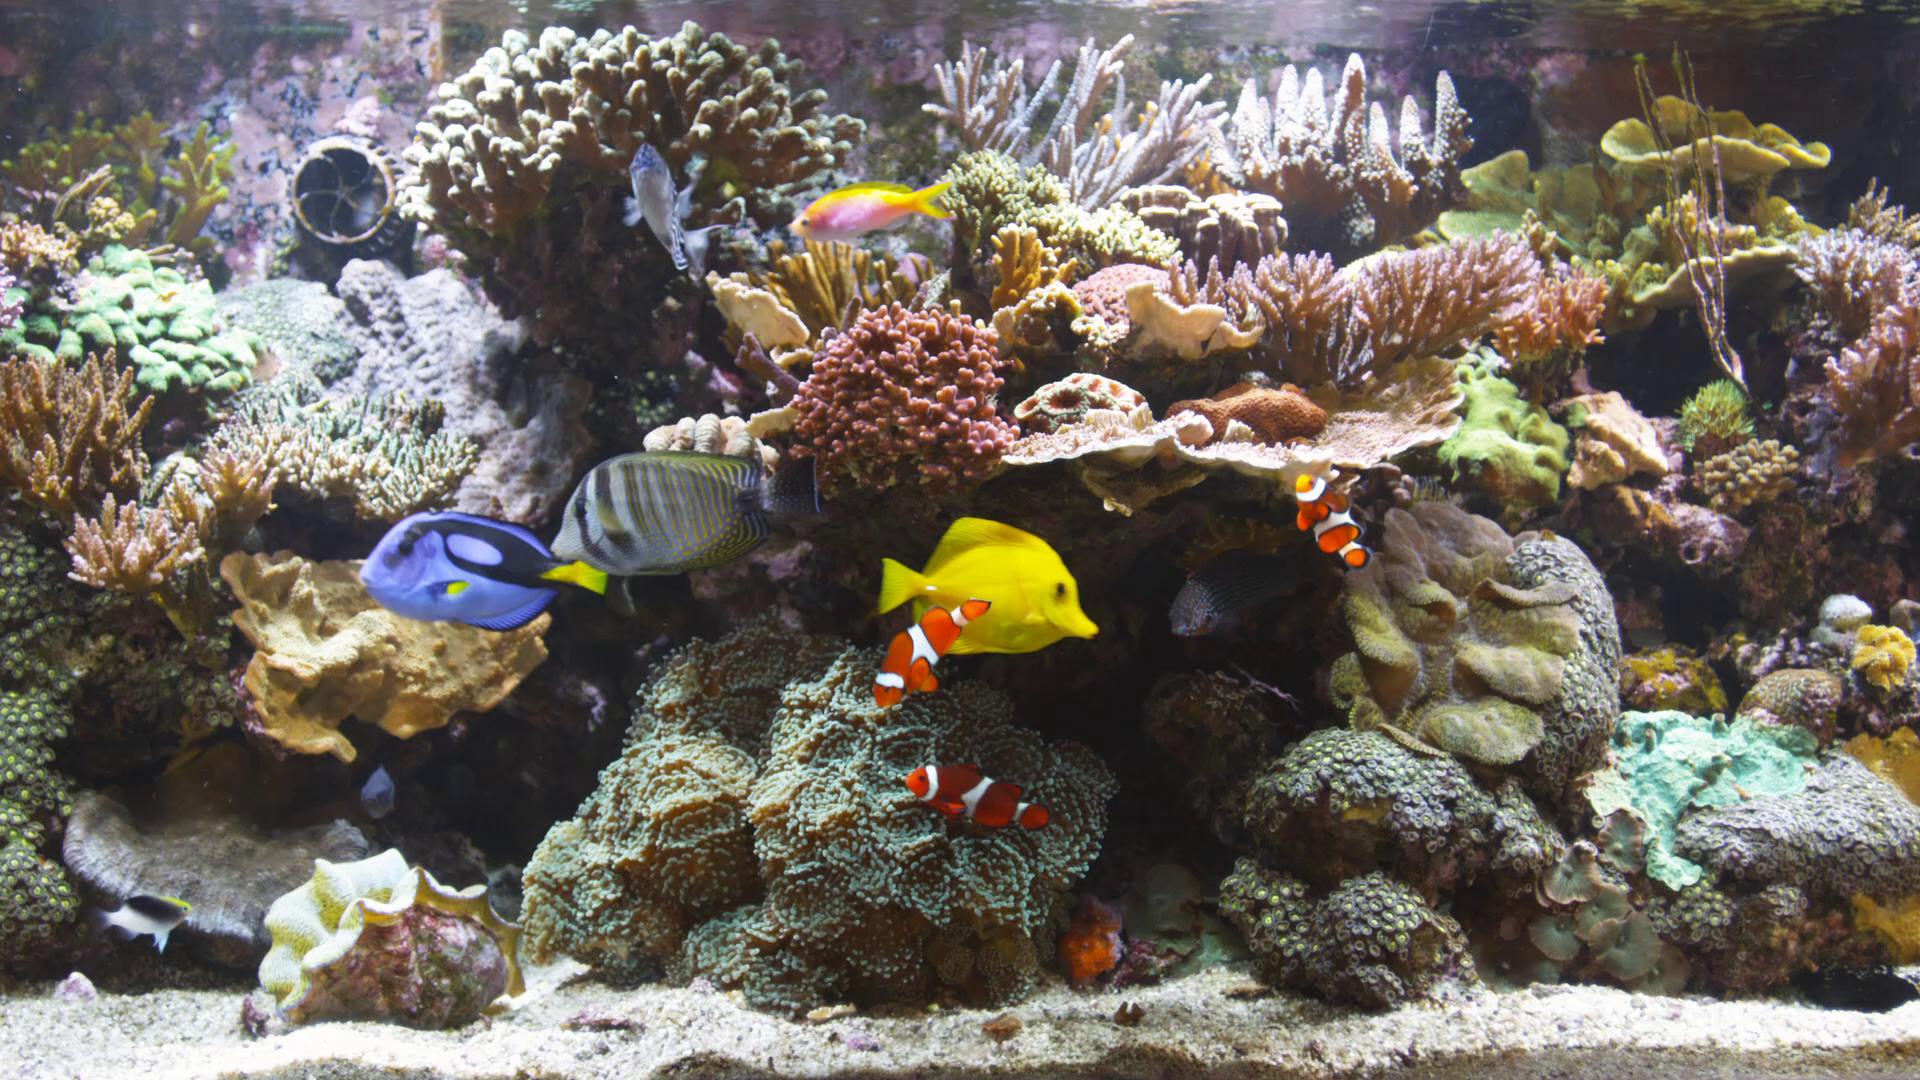 Bluscenes Coral Reef Aquarium Wallpaper 151723